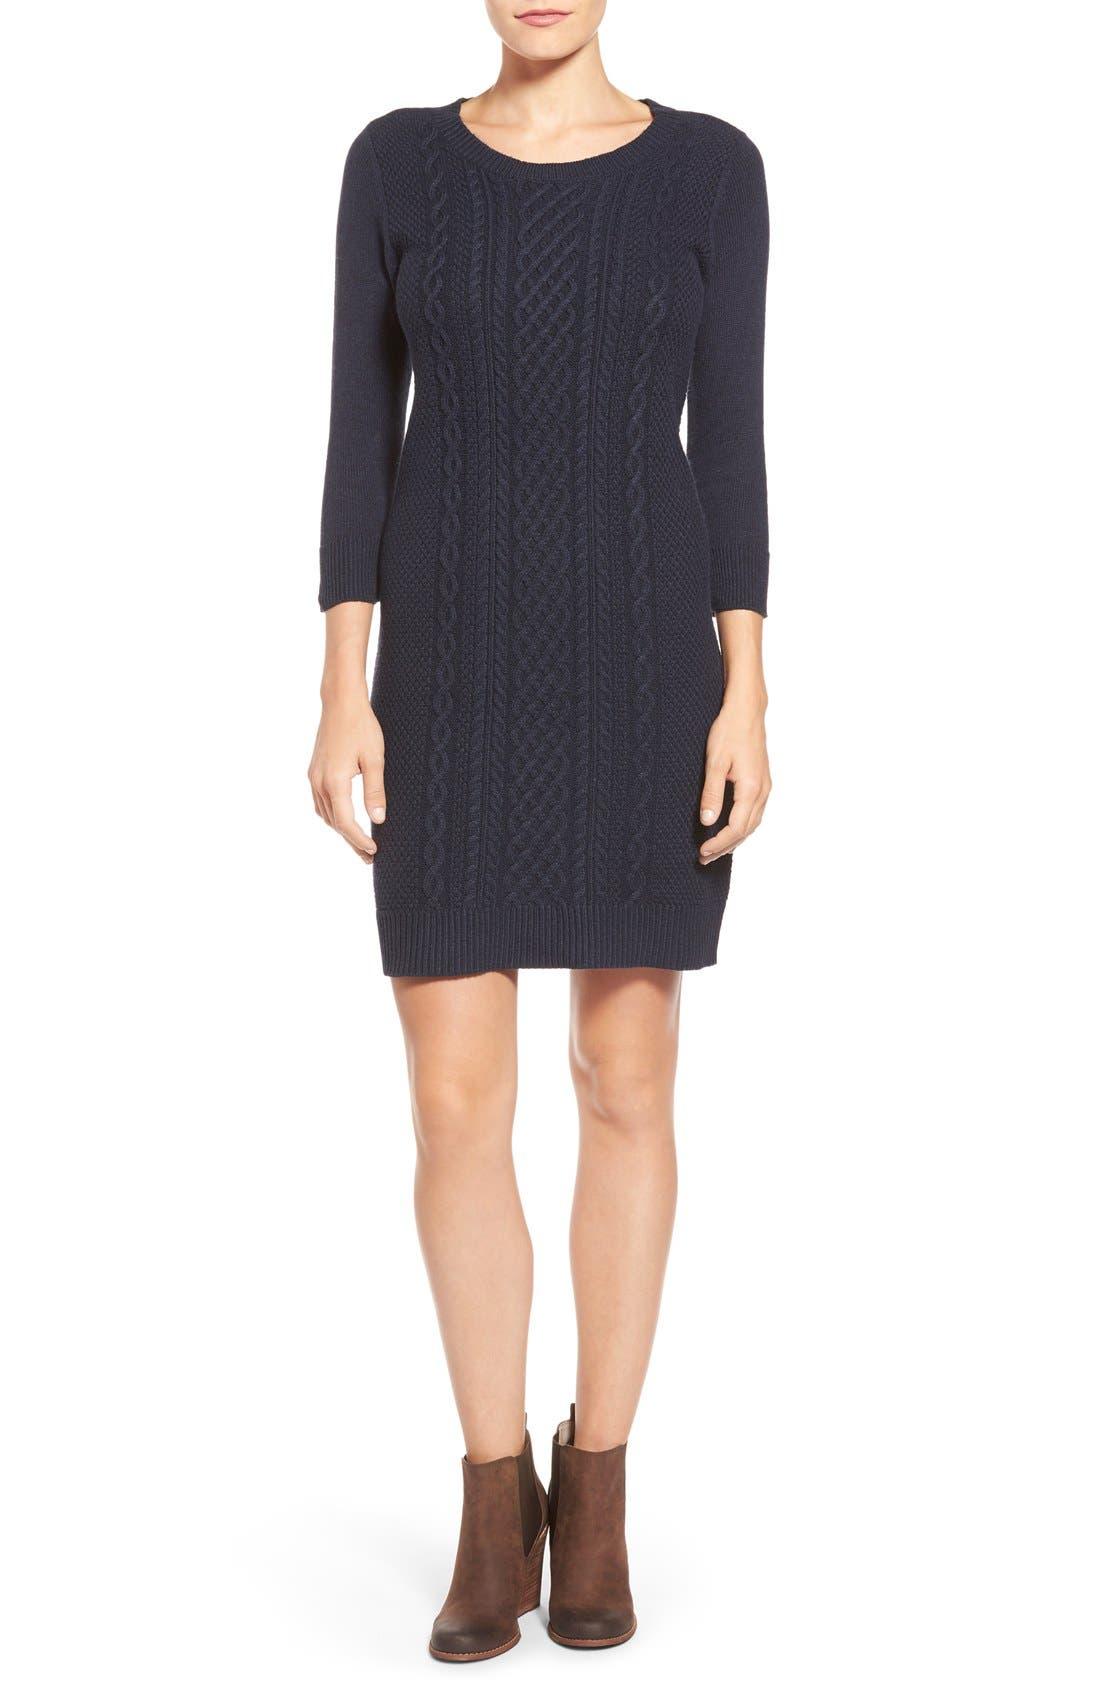 Alternate Image 1 Selected - Caslon® Cable Knit Sweater Dress (Regular & Petite)